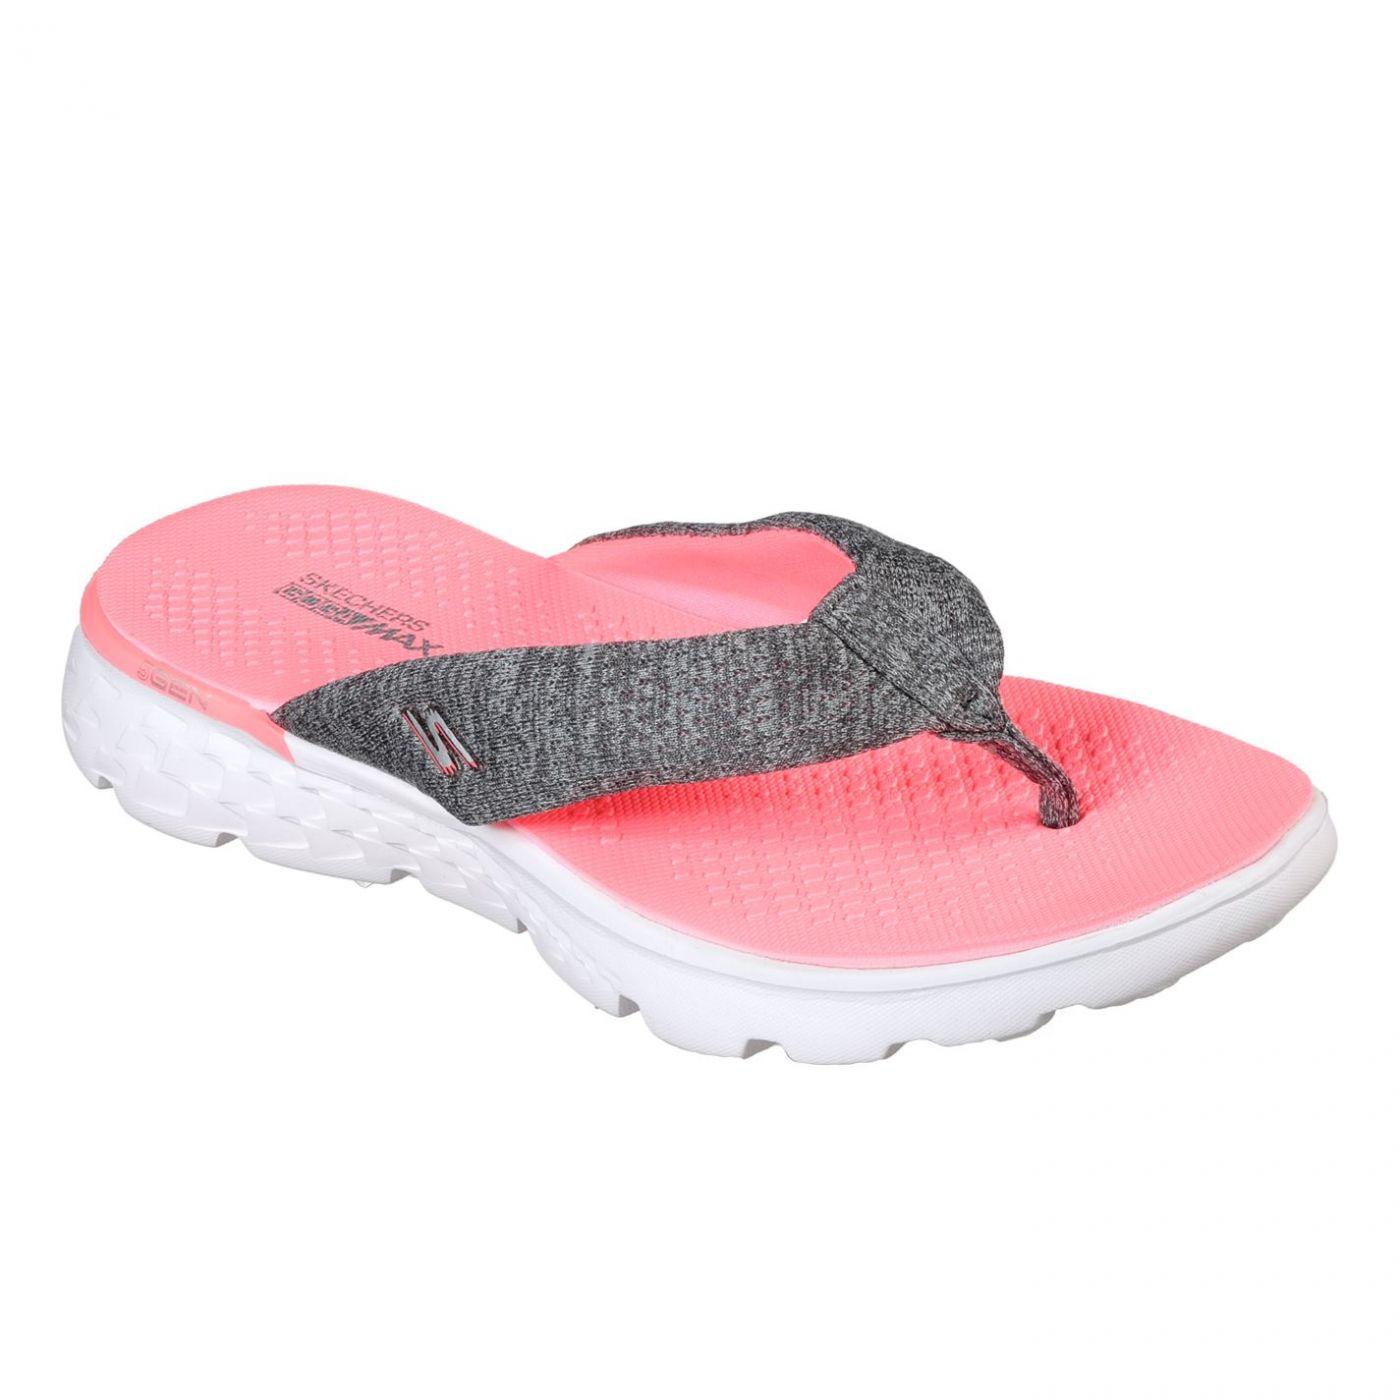 Skechers On The Go Vivacity Flip Flops Ladies